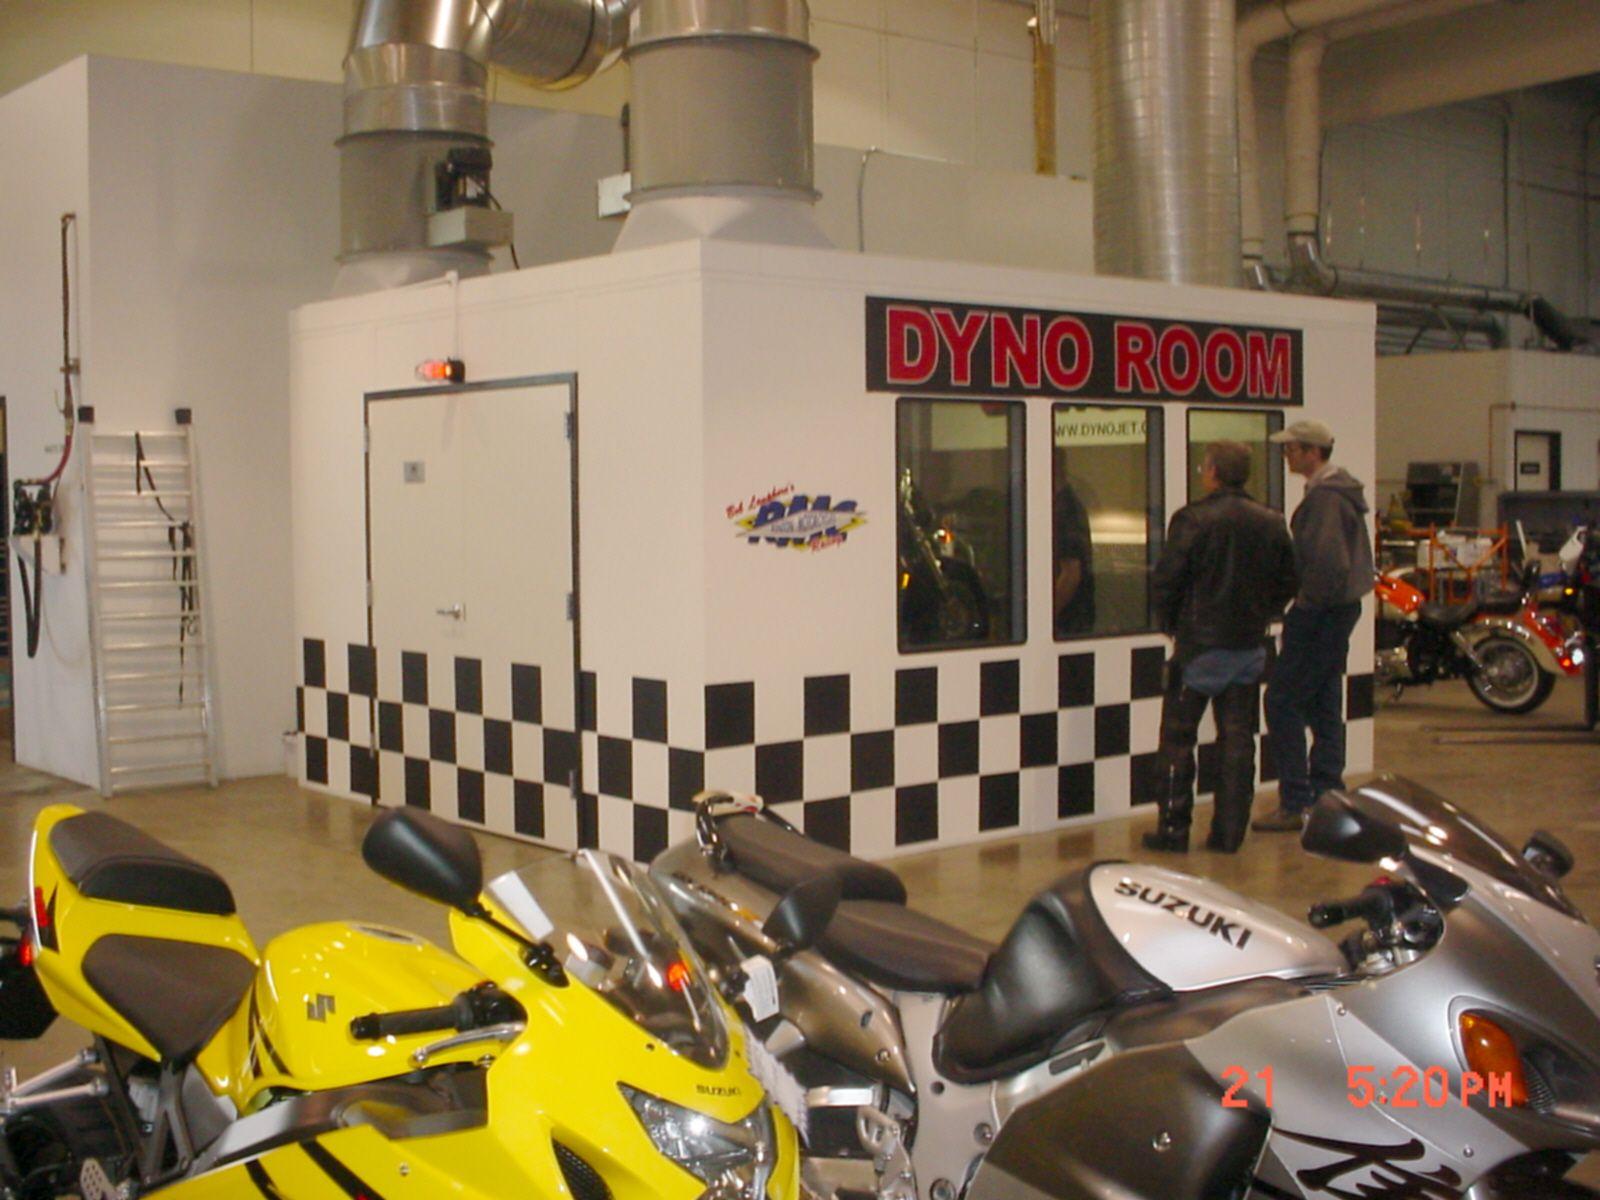 Motorcycle Test Room Room Motorcycle Stationary Bike